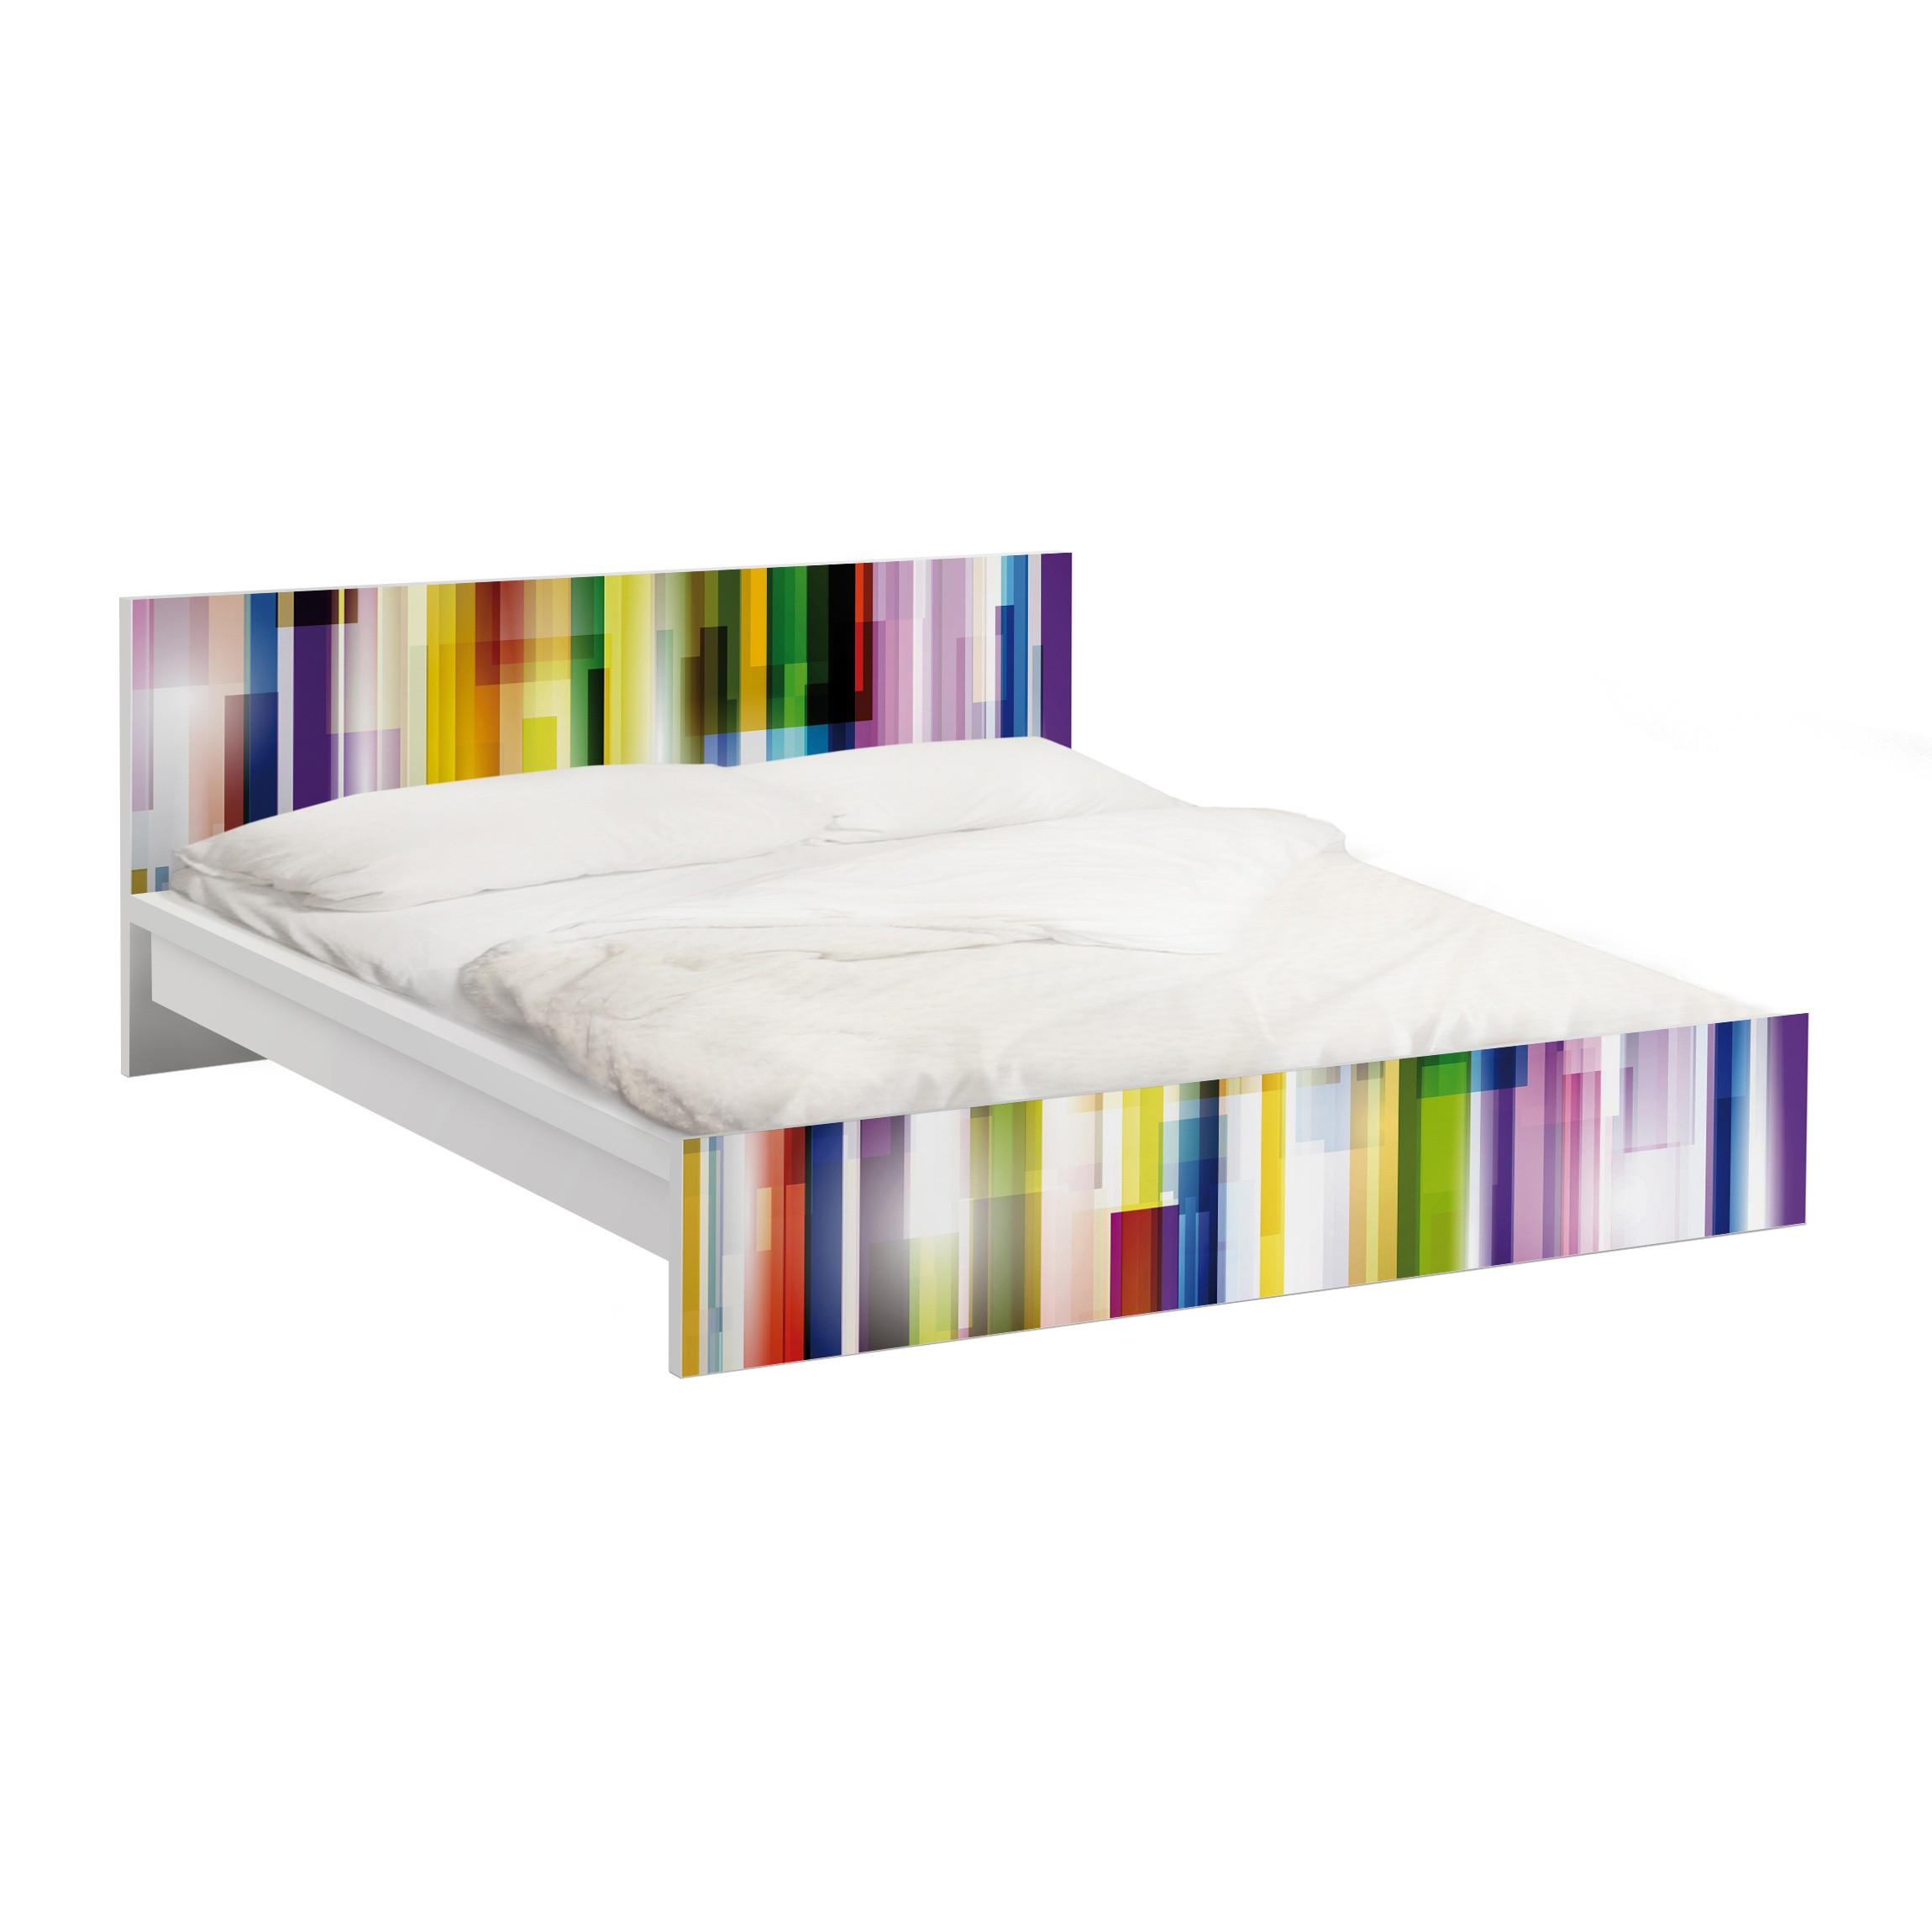 m belfolie f r ikea malm bett niedrig 160x200cm klebefolie rainbow cubes. Black Bedroom Furniture Sets. Home Design Ideas